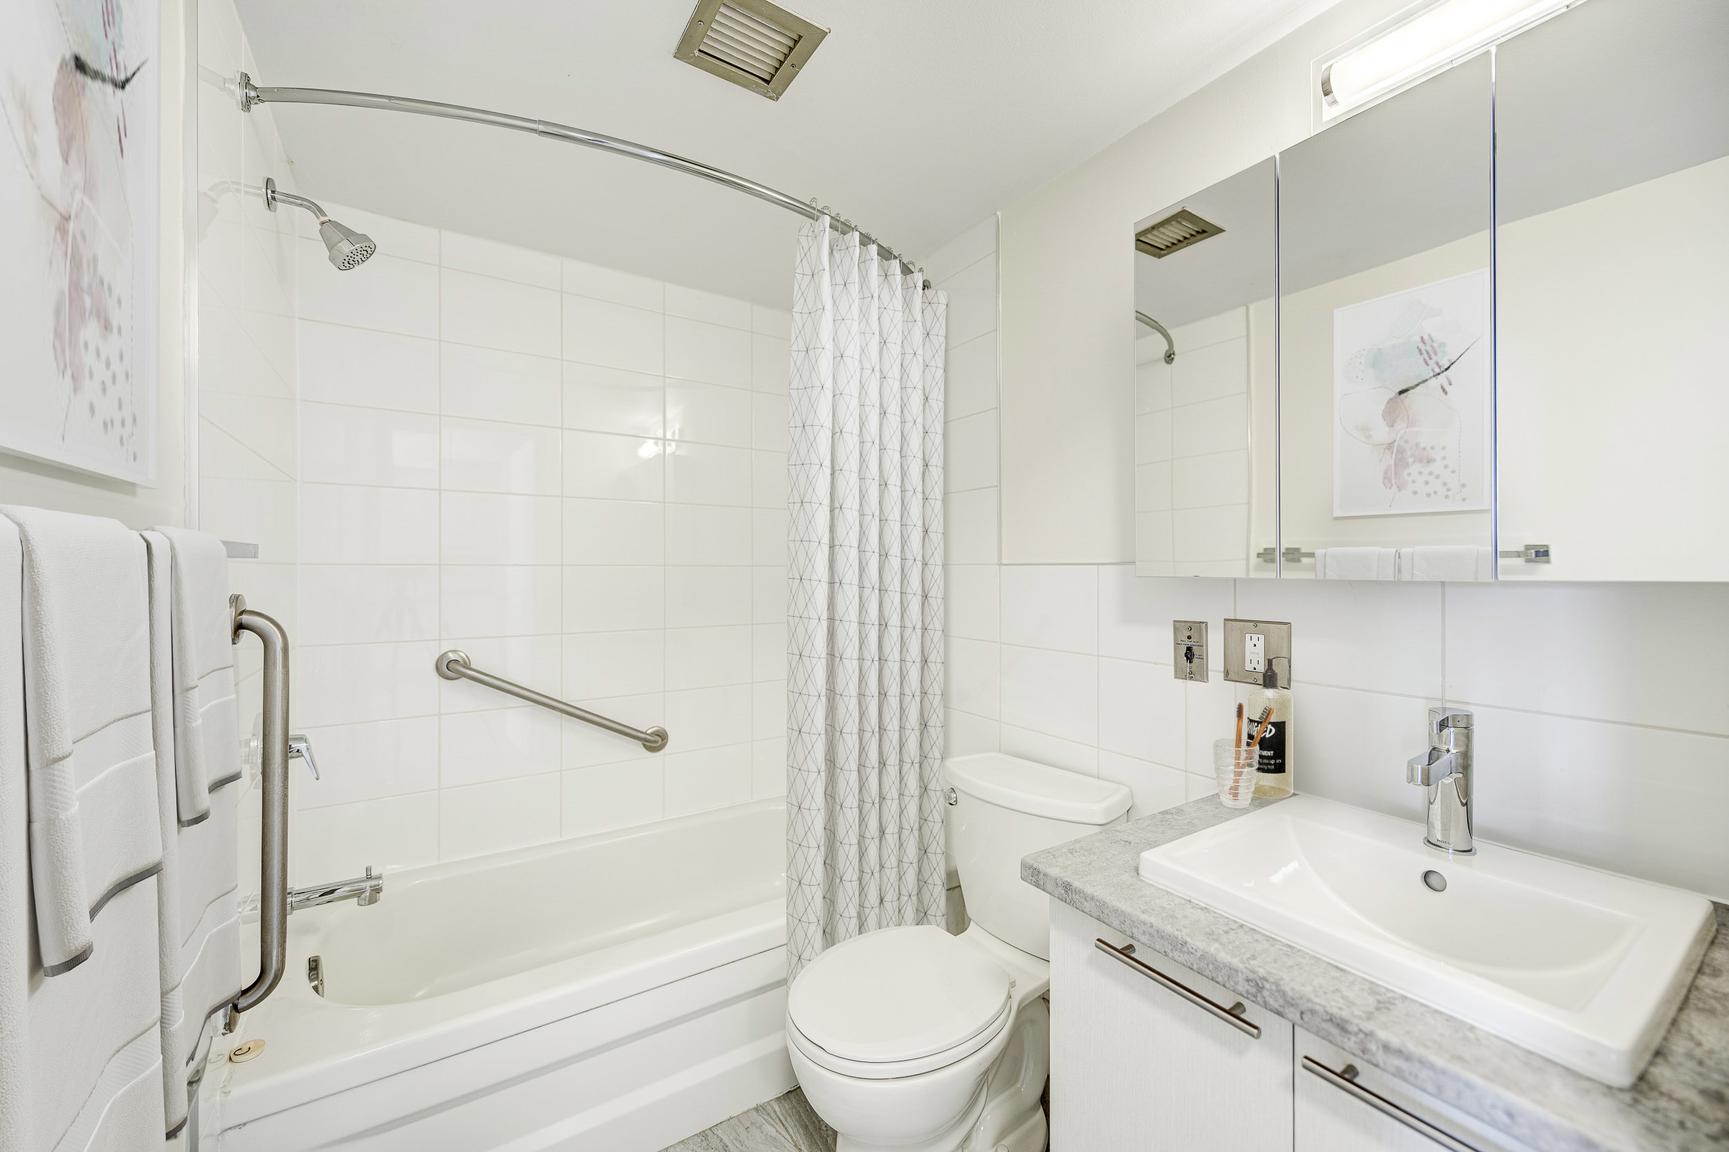 1 bedroom Apartments for rent in Laval at Le Quatre Cent - Photo 05 - RentersPages – L407184